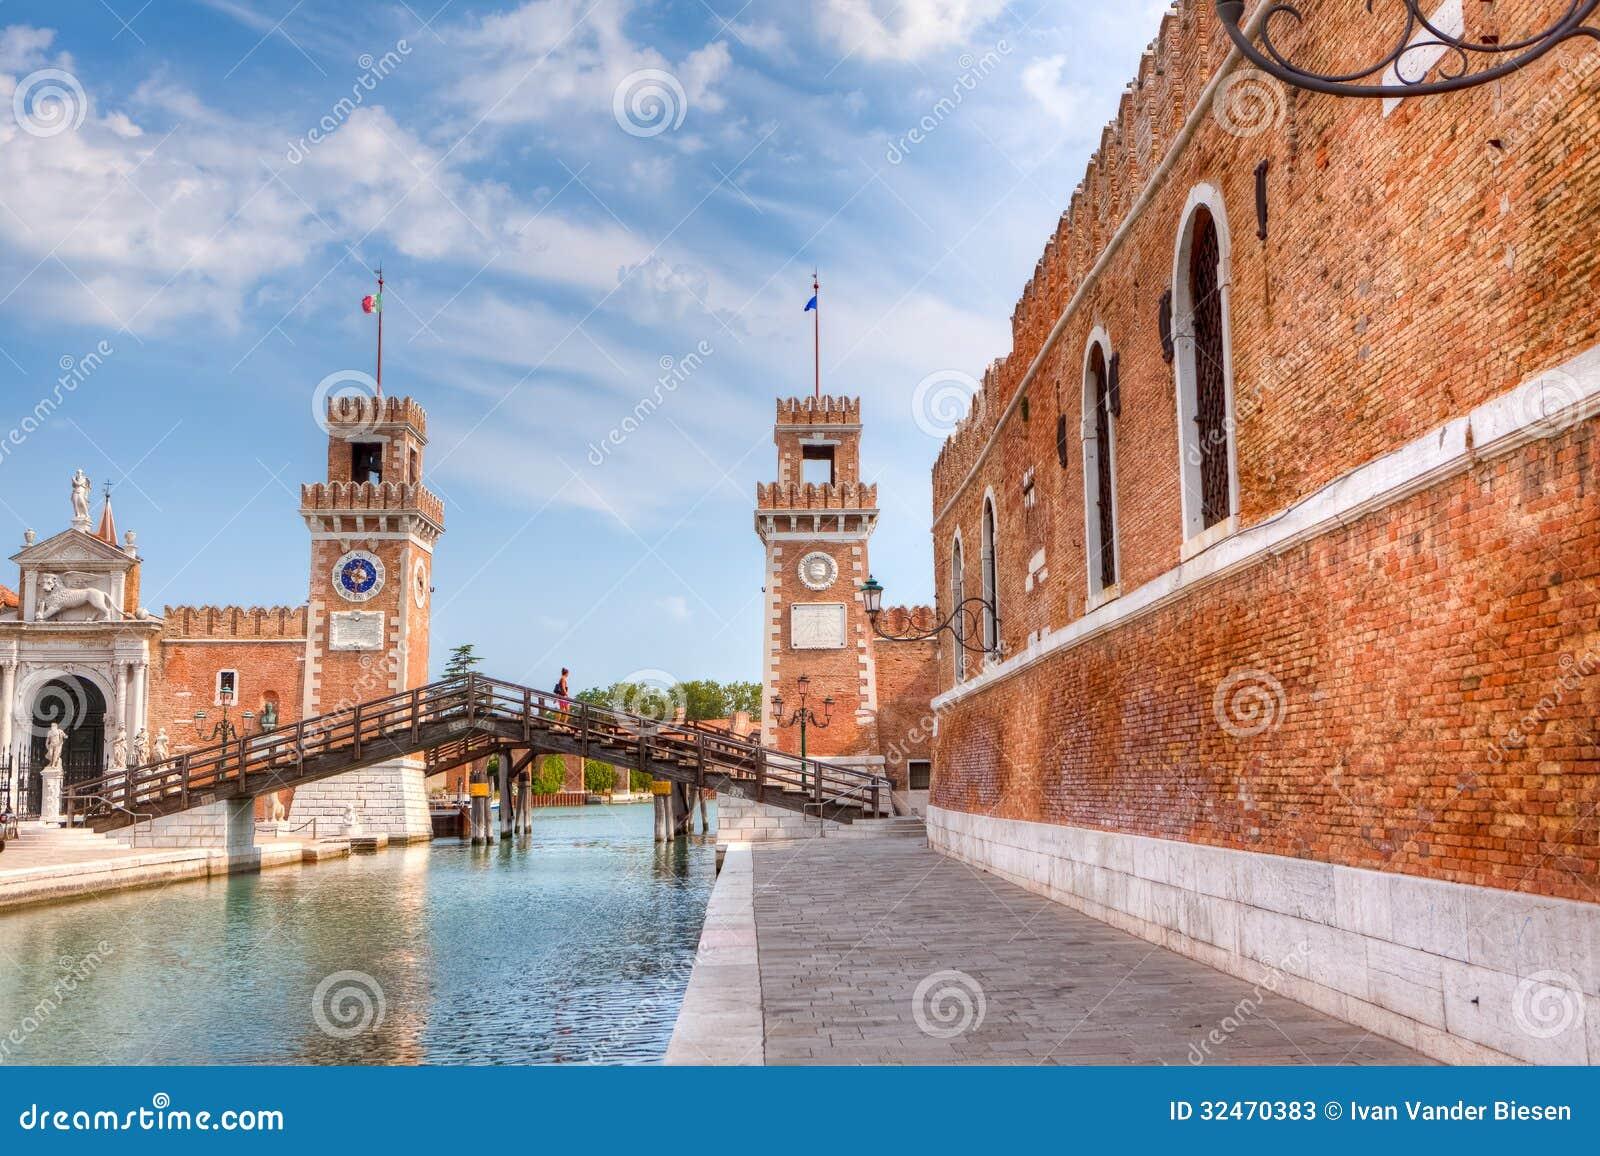 Entrance gate of the Arsenale, Venice